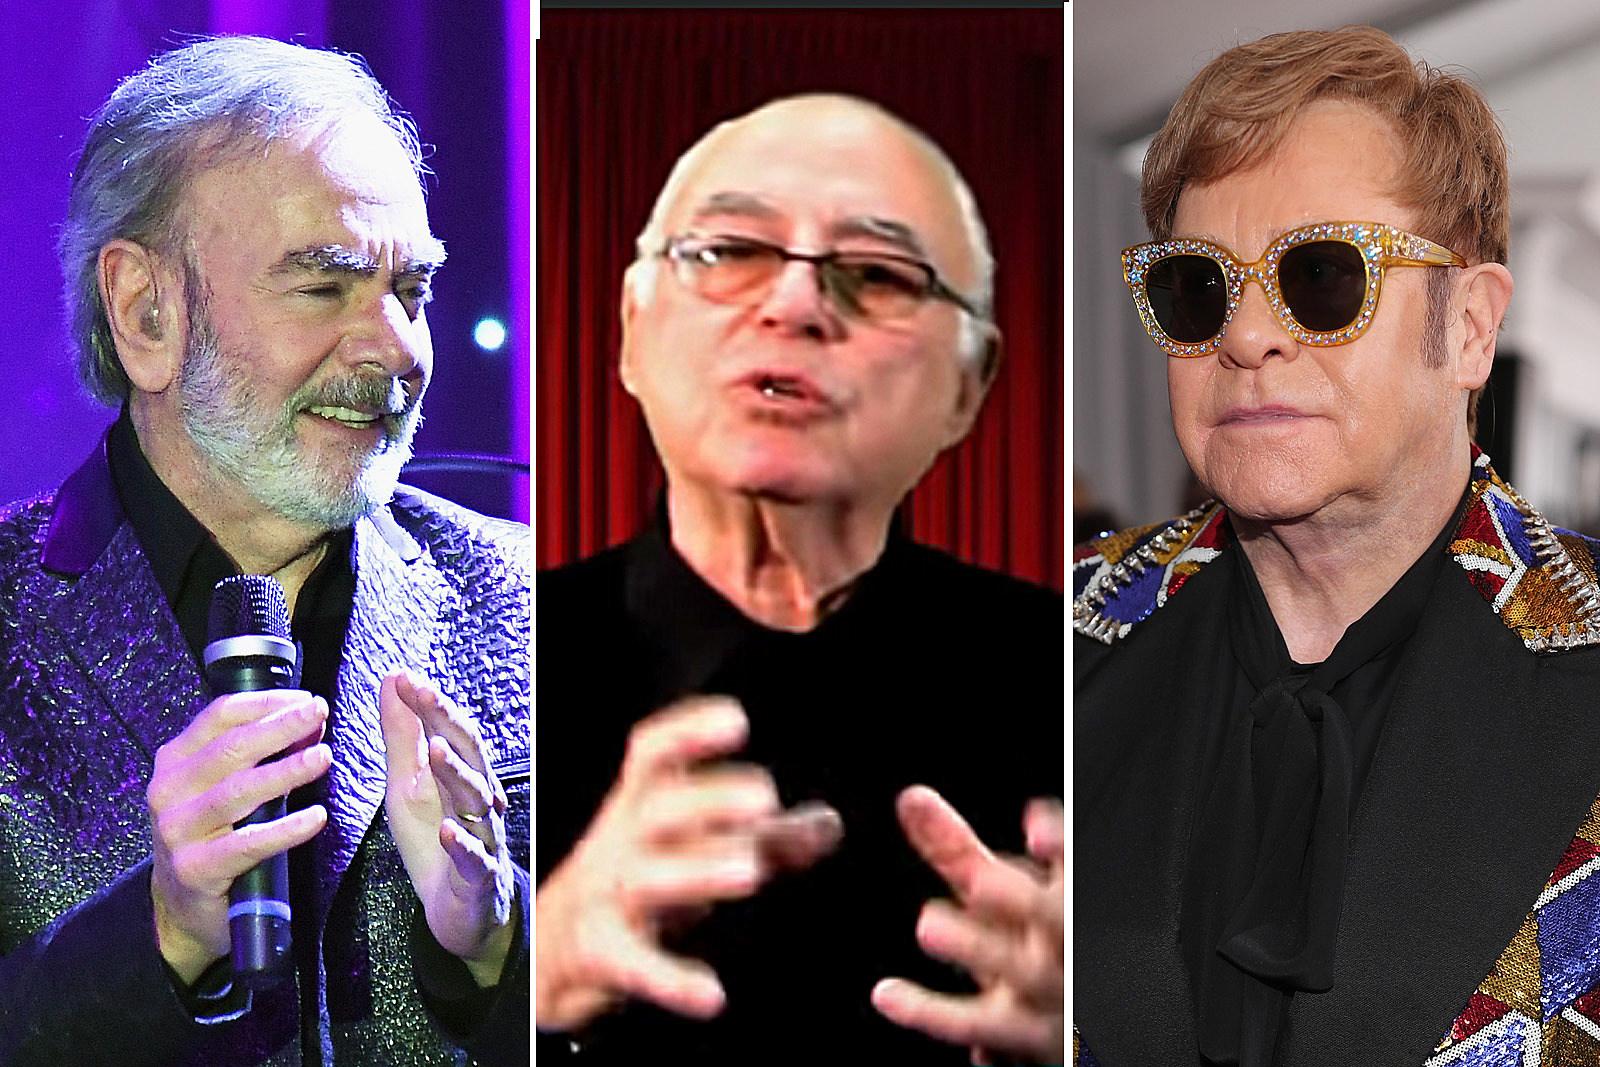 Watch Elton John Fail to Rap in New Commercial